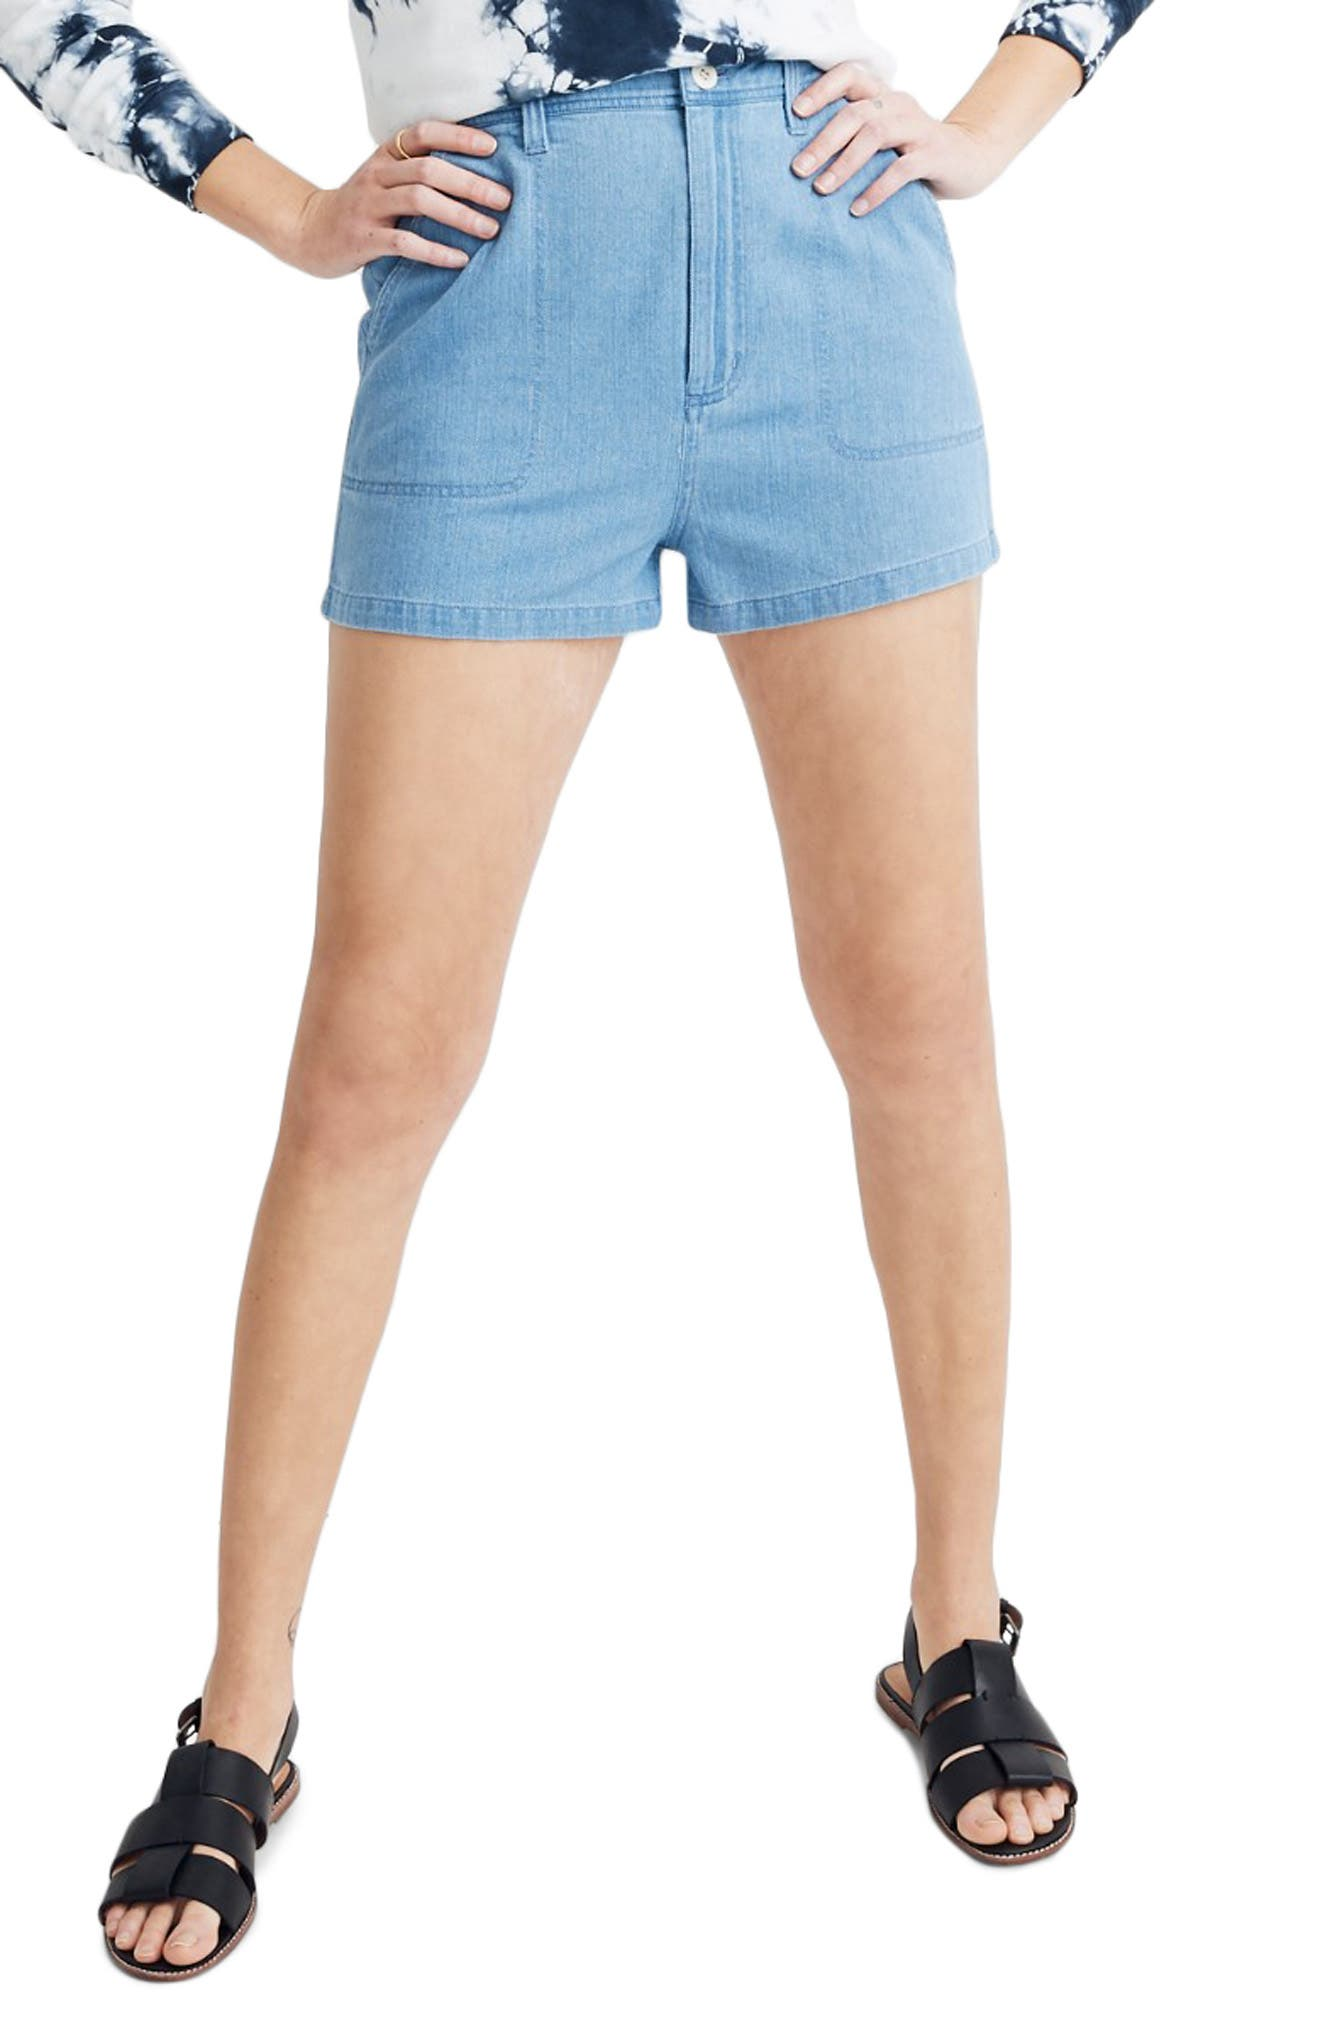 Vintage High Waisted Shorts, Sailor Shorts, Retro Shorts Womens Madewell Denim Camp Shorts $29.70 AT vintagedancer.com